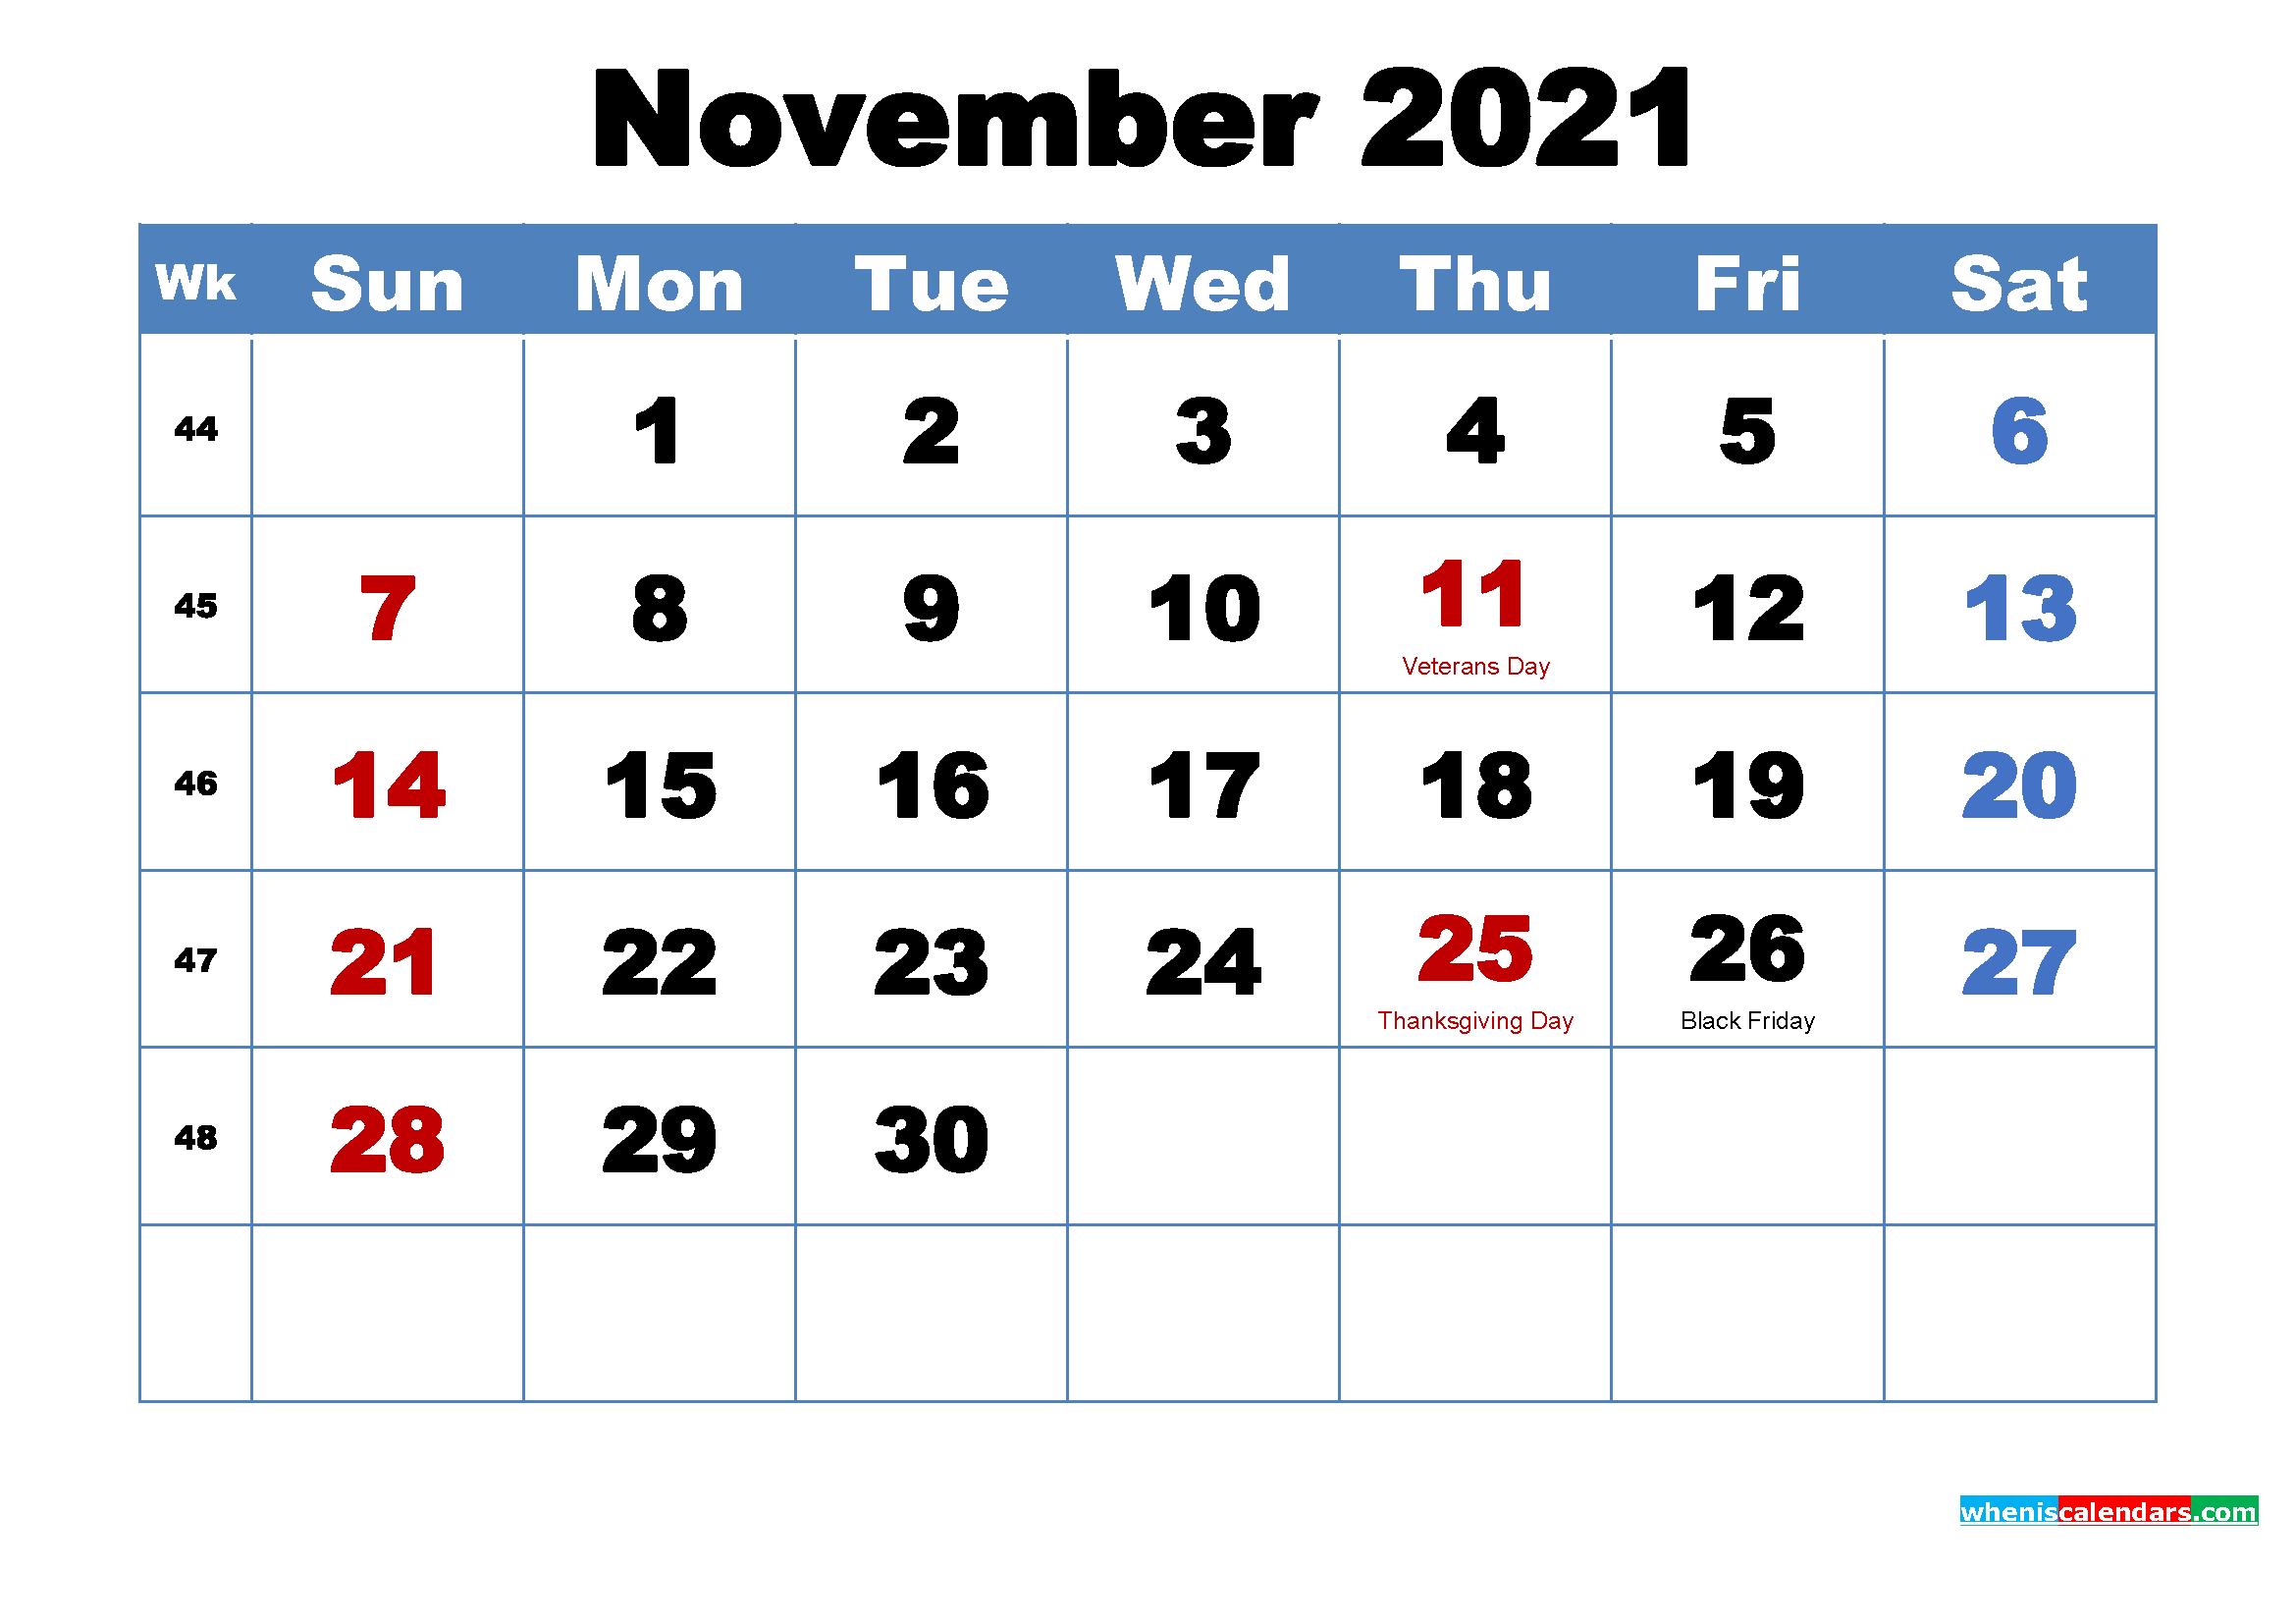 November 2021 Calendar Wallpaper Free Download